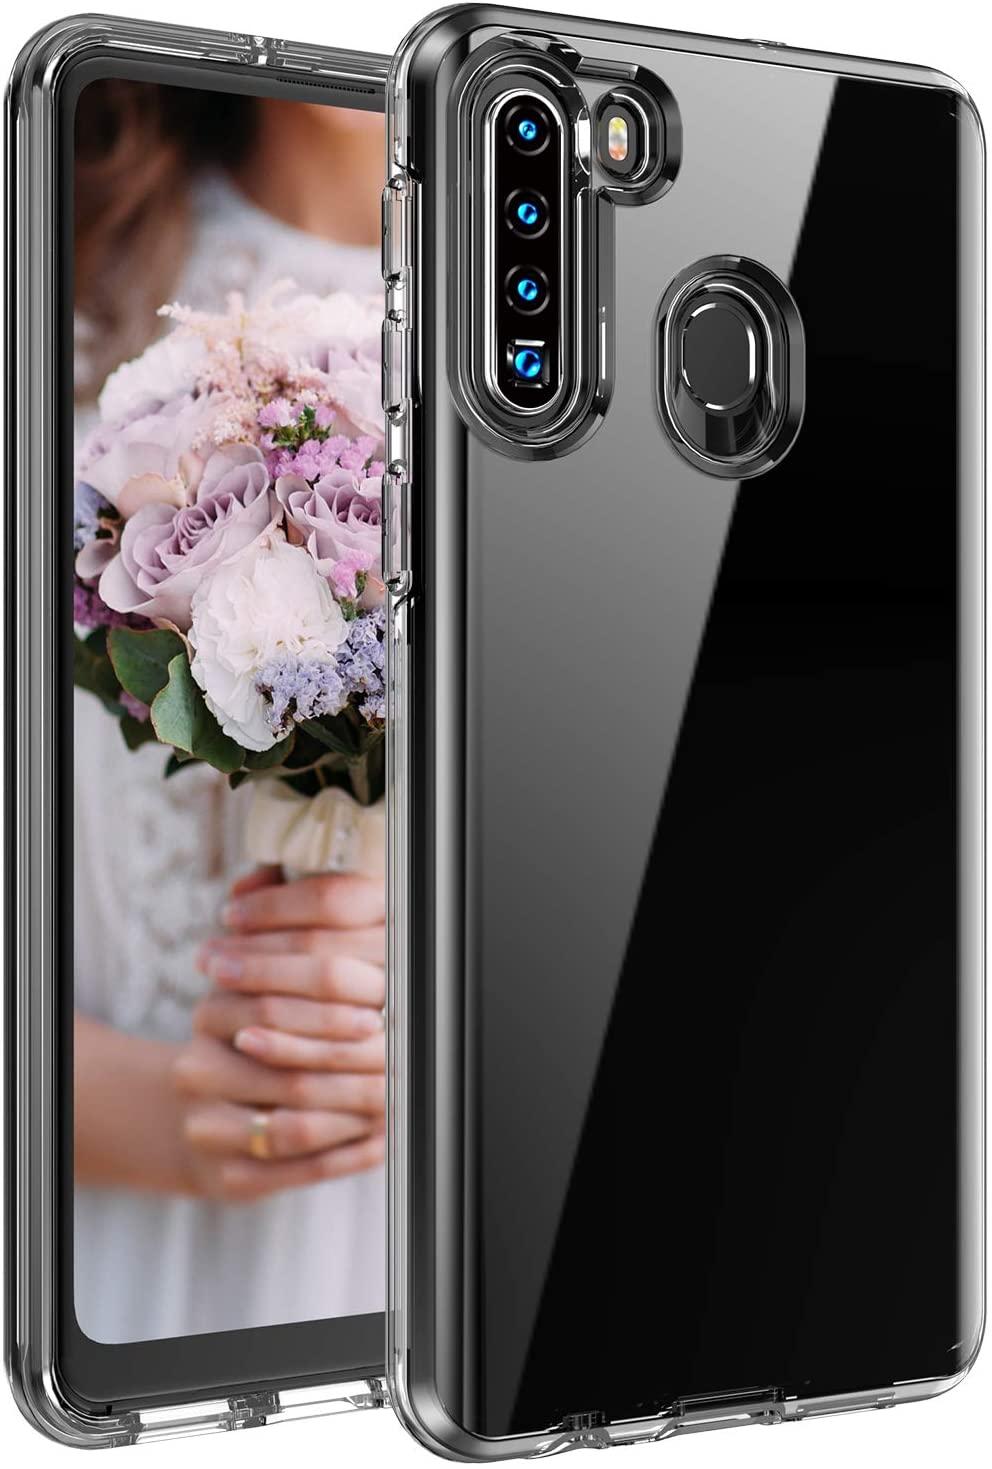 Base B-Air - Samsung A21 - Crystal Clear Slim Protective Case